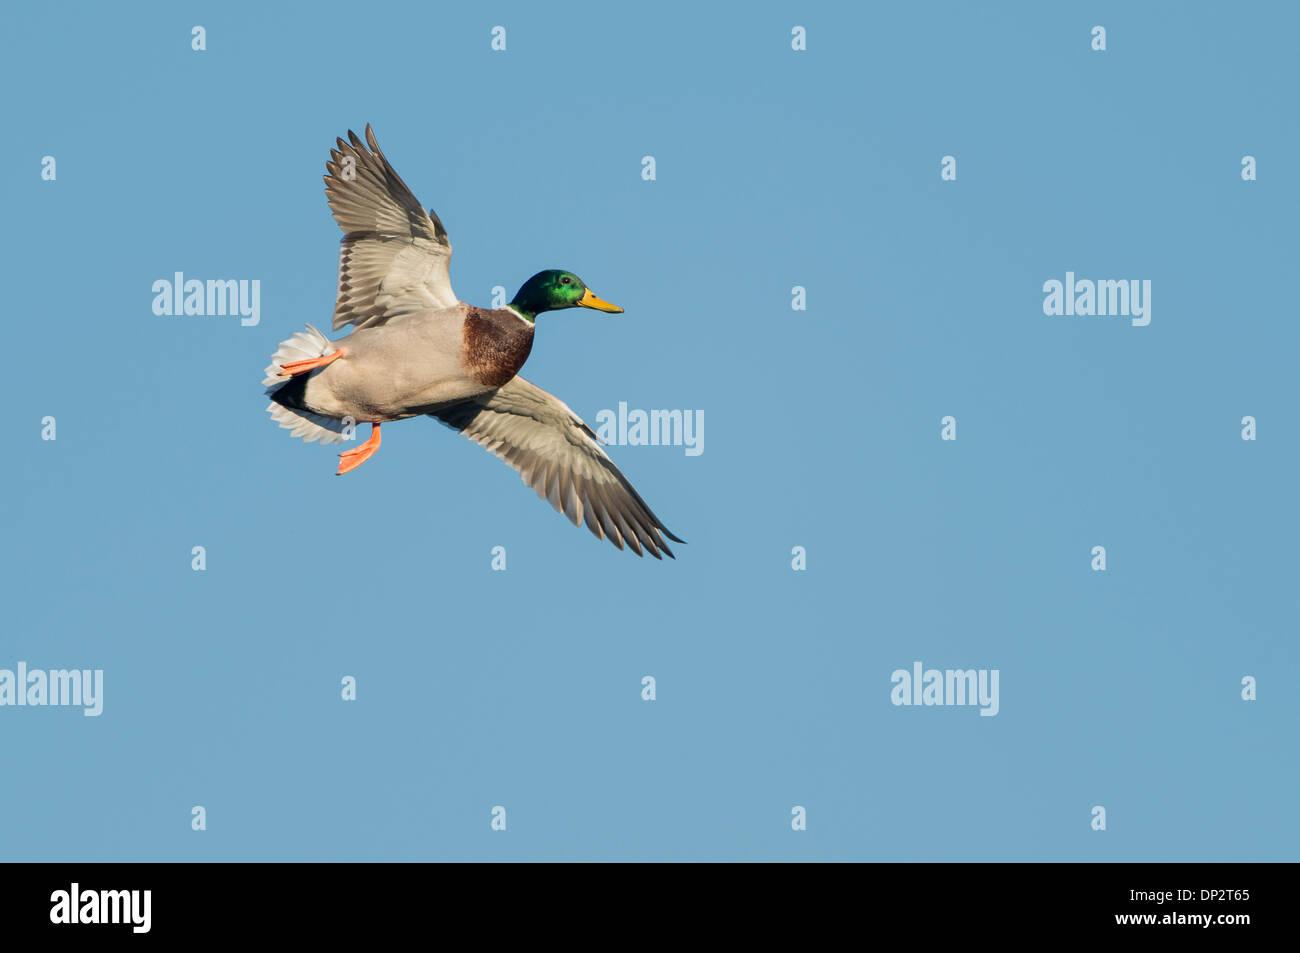 Mallard (Anas platyrhynchos) in flight, North Texas - Stock Image